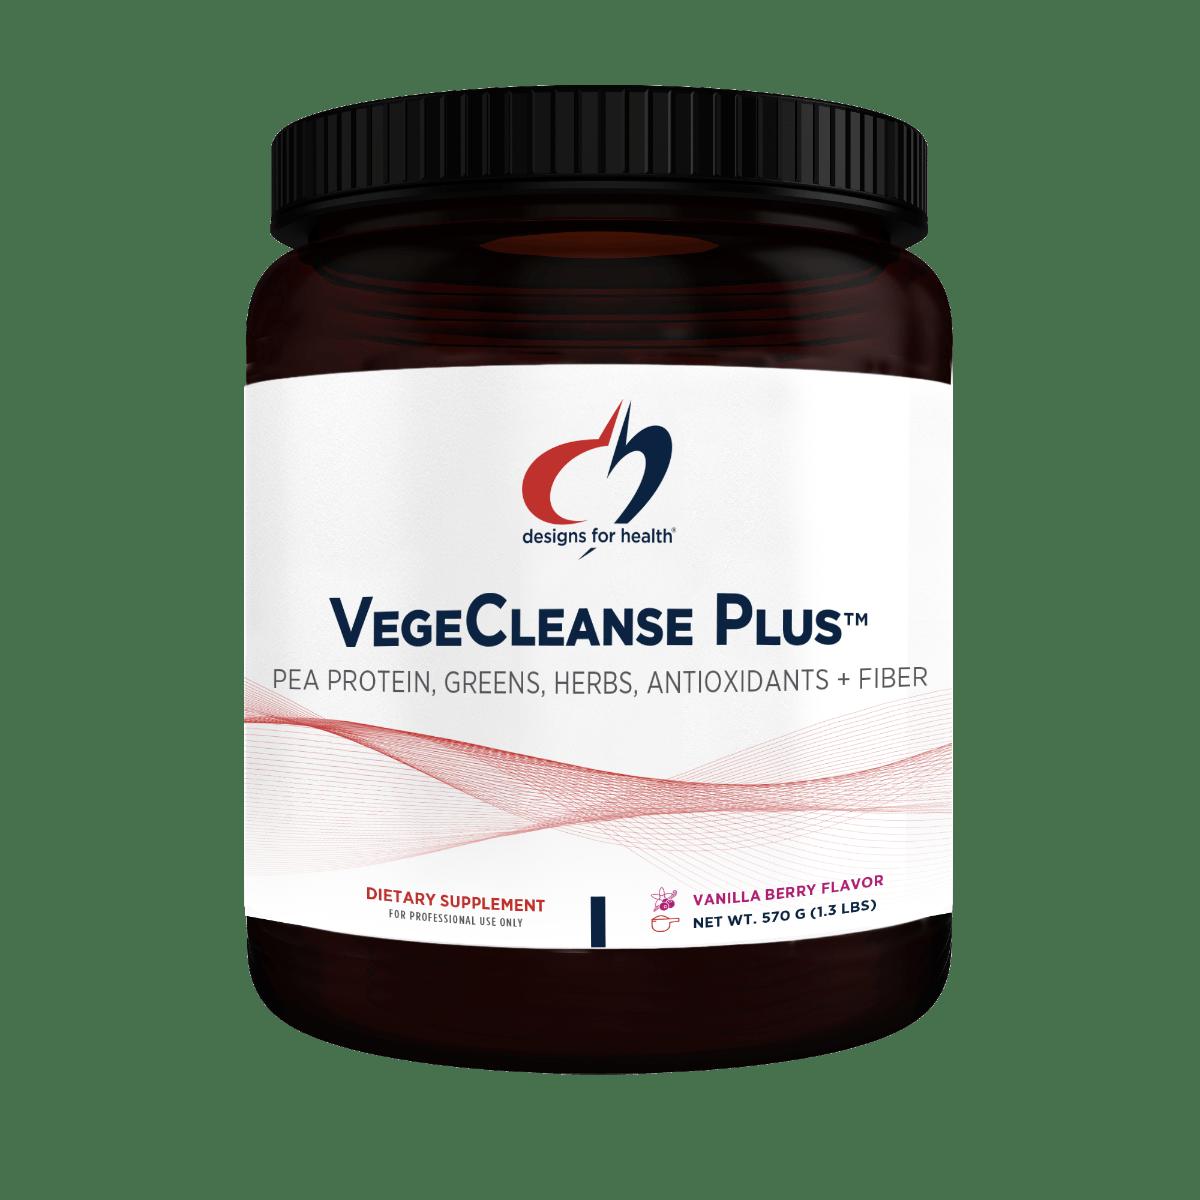 VegeCleanse Plus Powder 570 g (1.3 lbs) Designs for Health